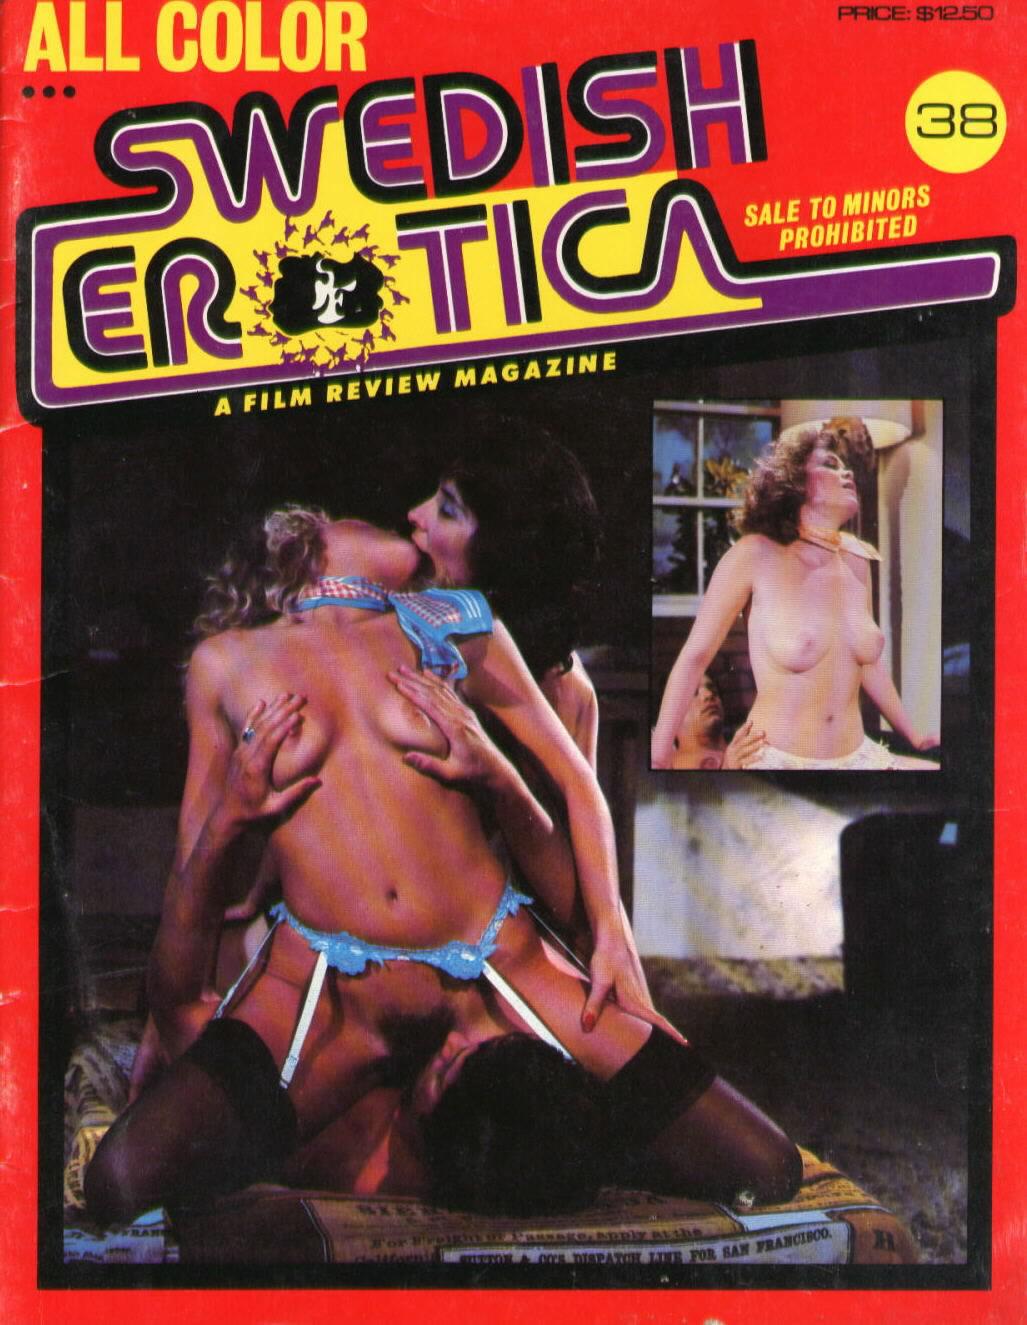 swedish erotica john holmes photos